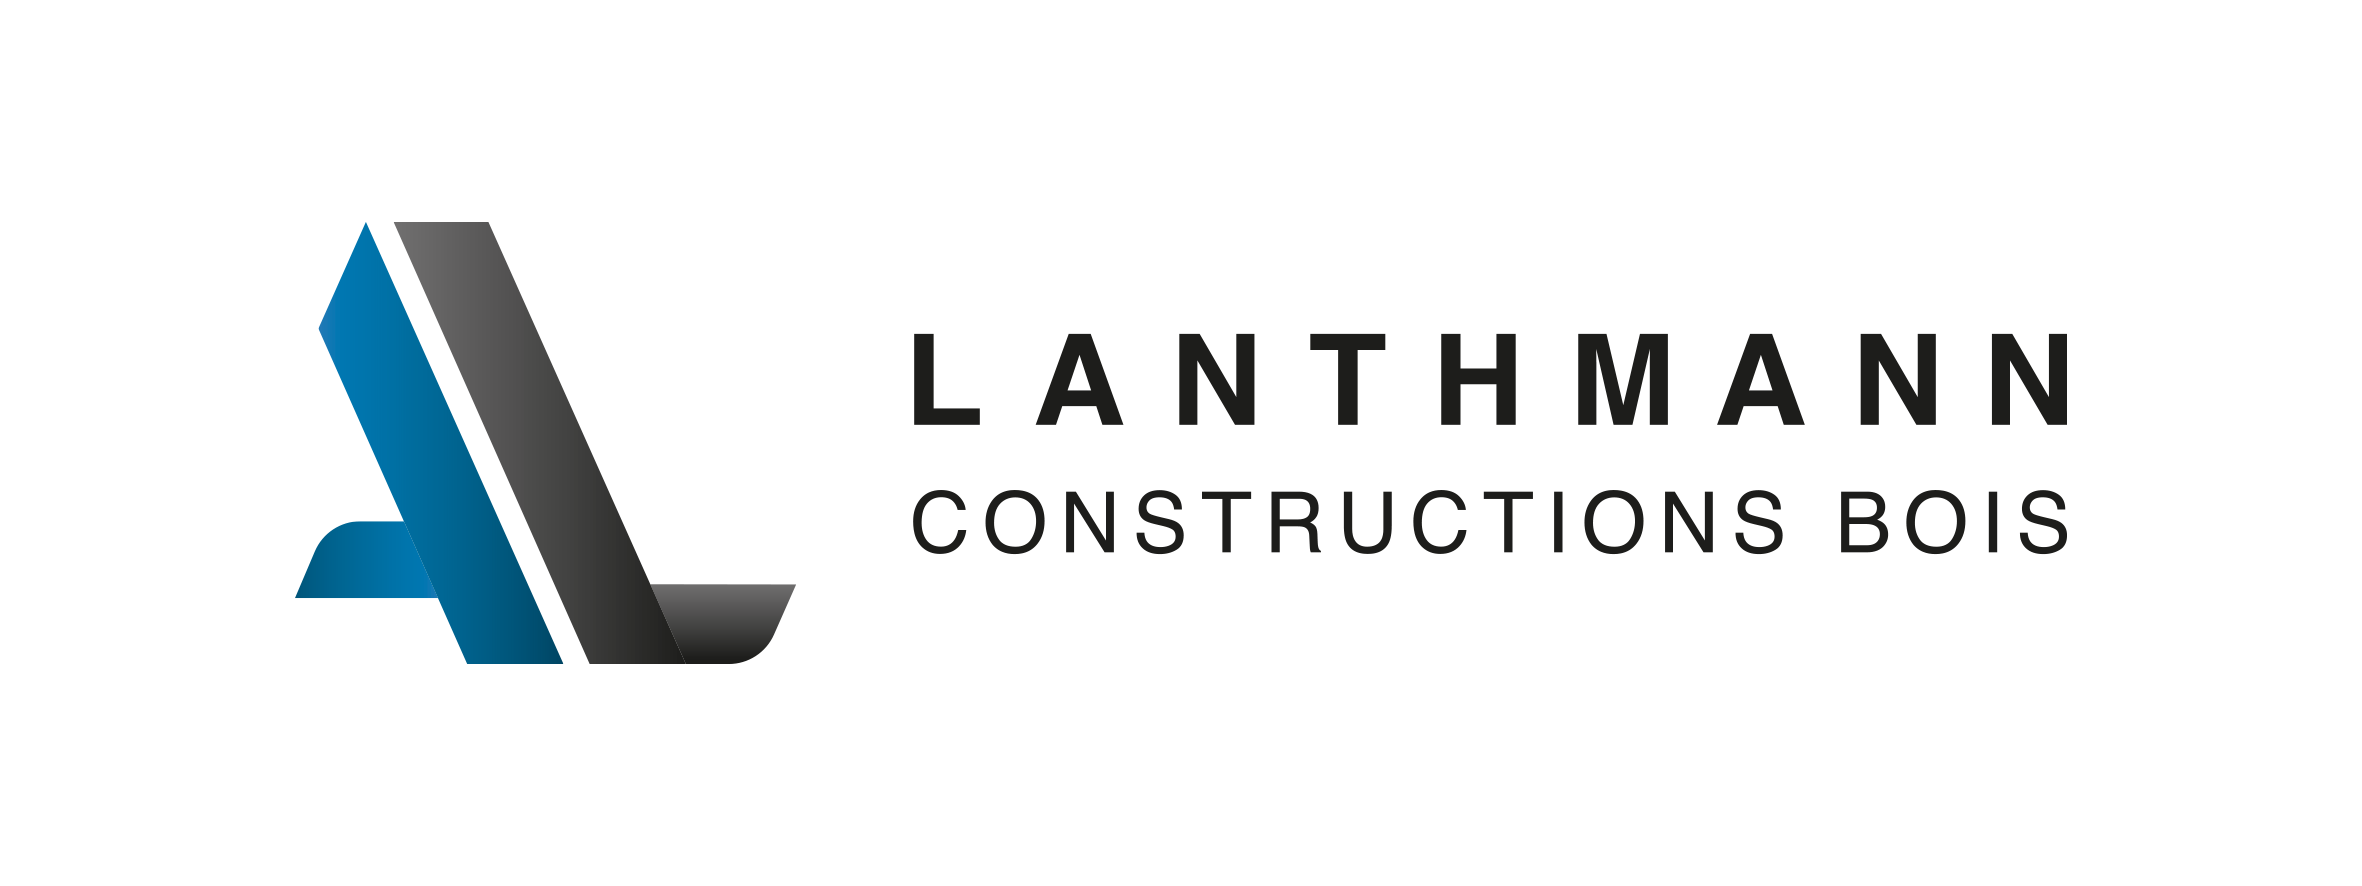 Lanthmann constructions bois - Montbovon, Fribourg, Suisse